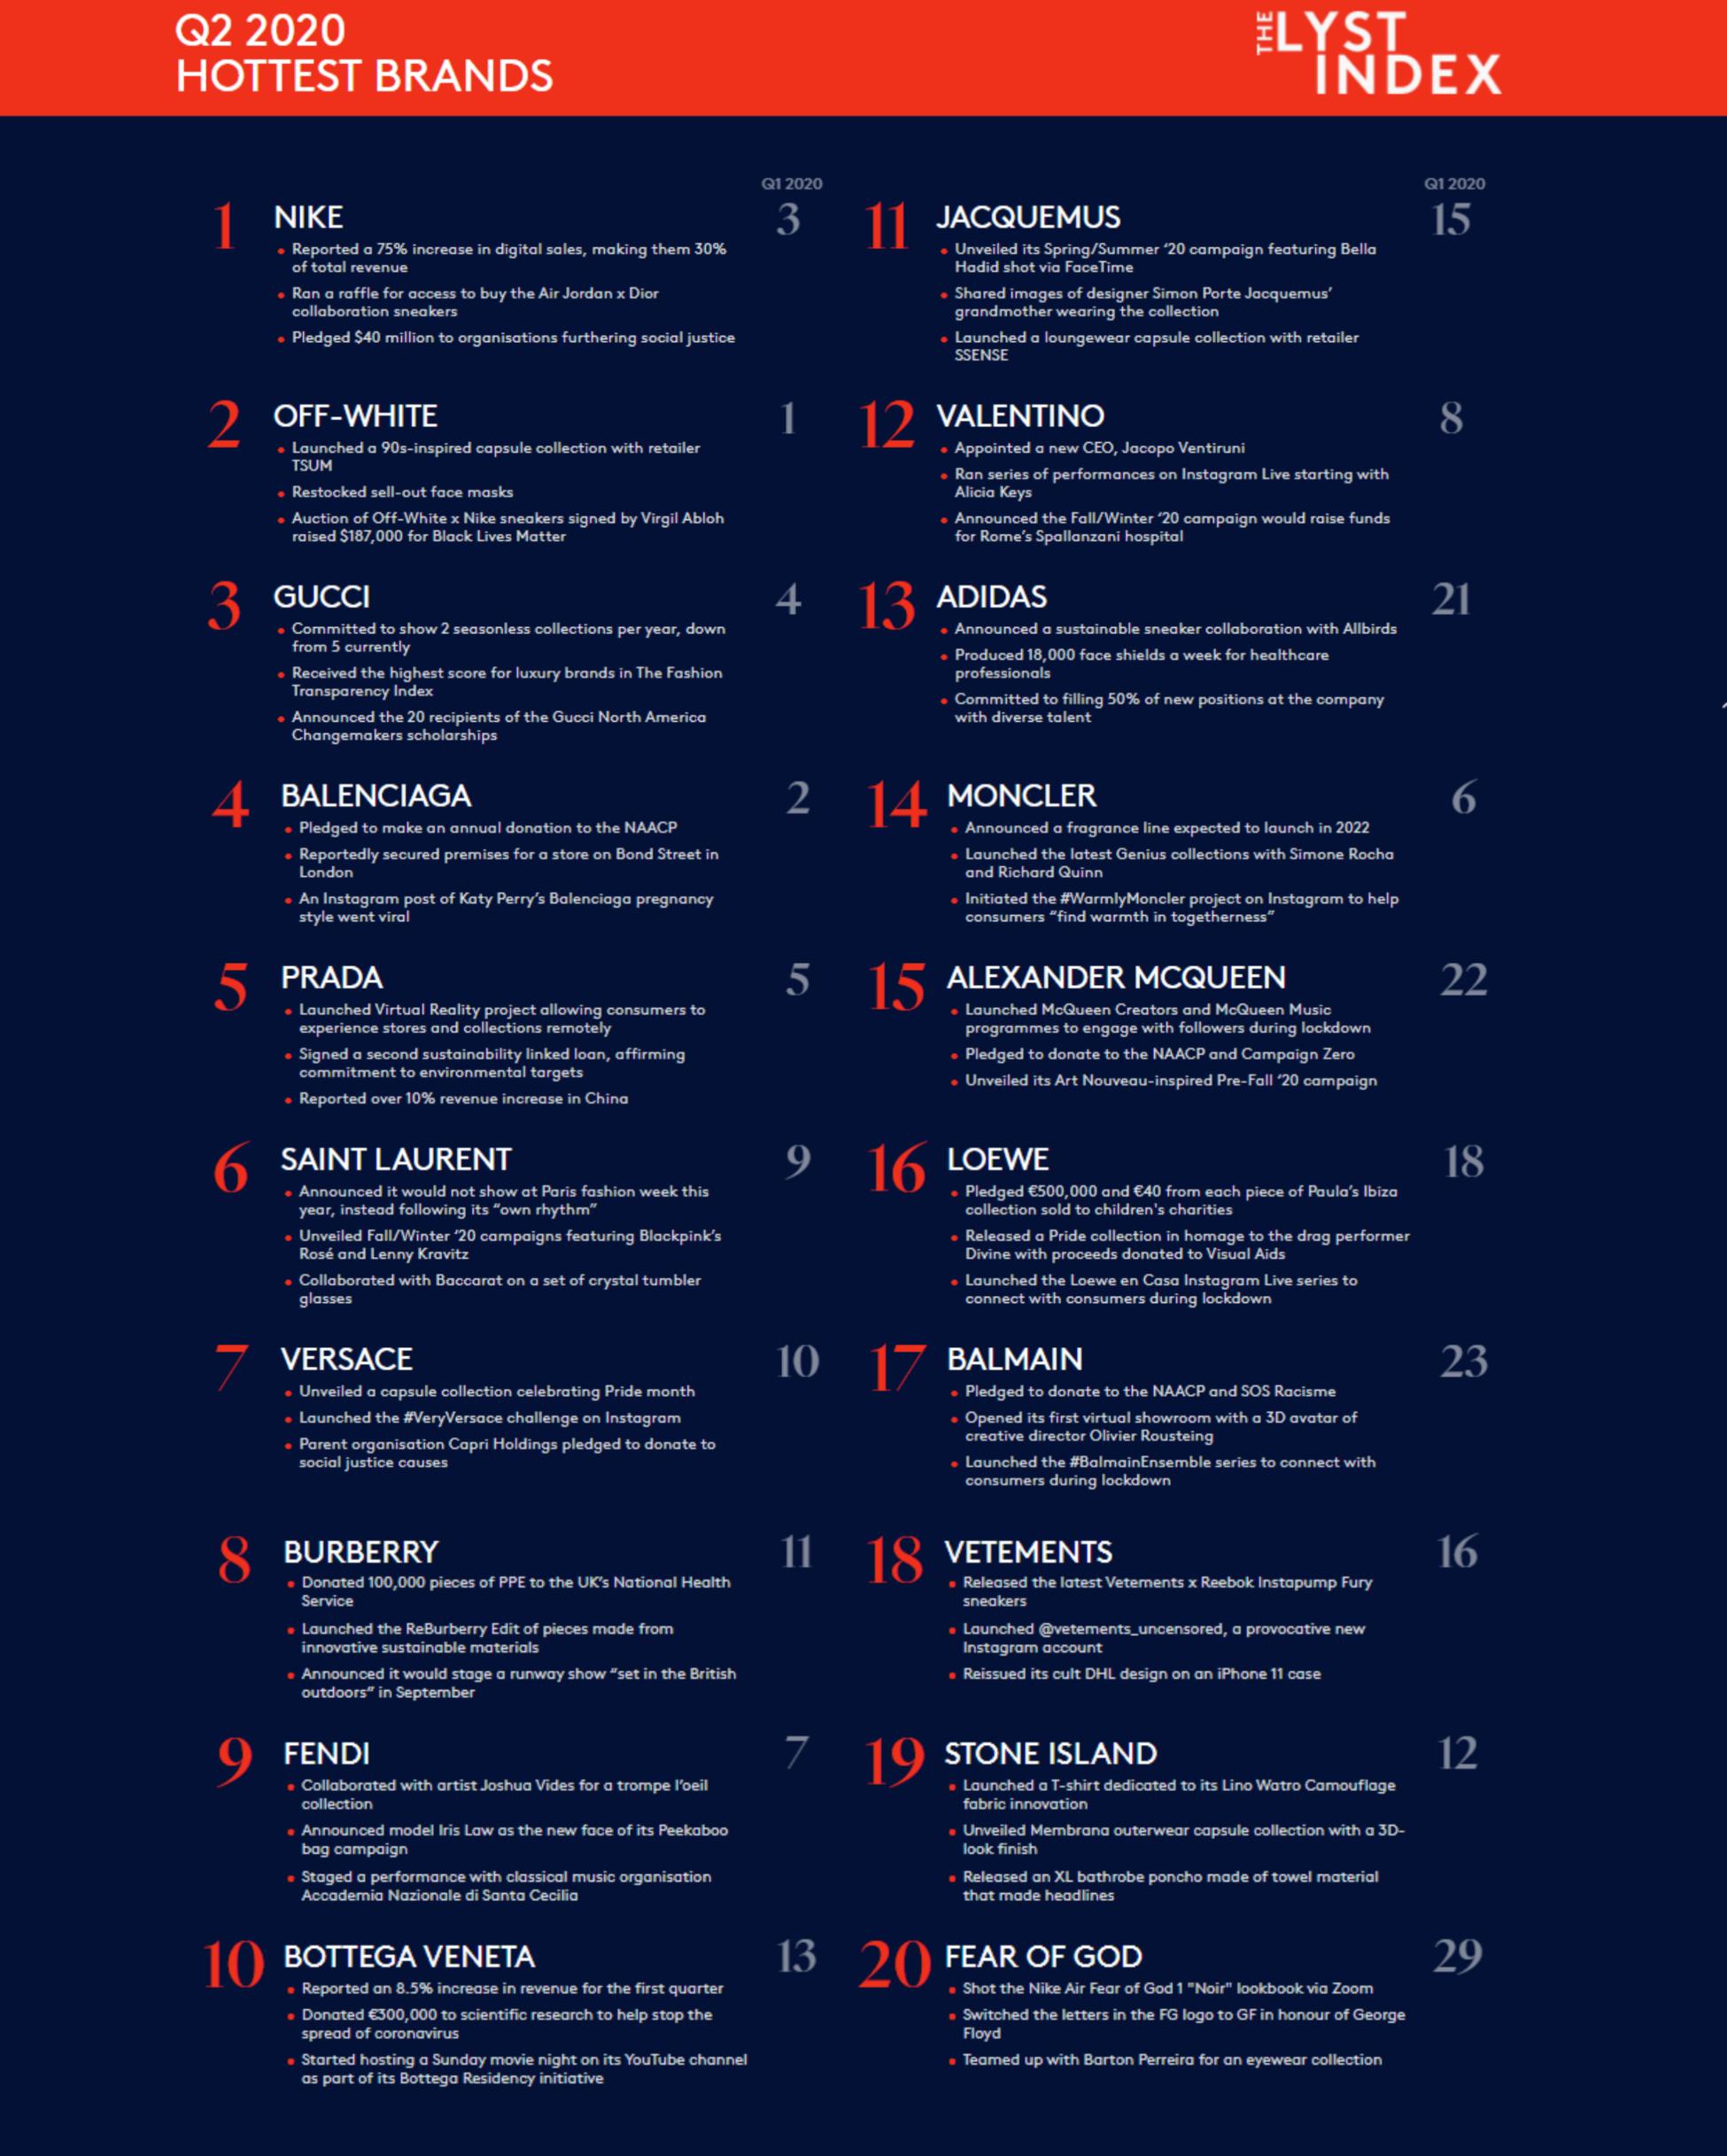 bxh top 20 quý 2 2020 lyst